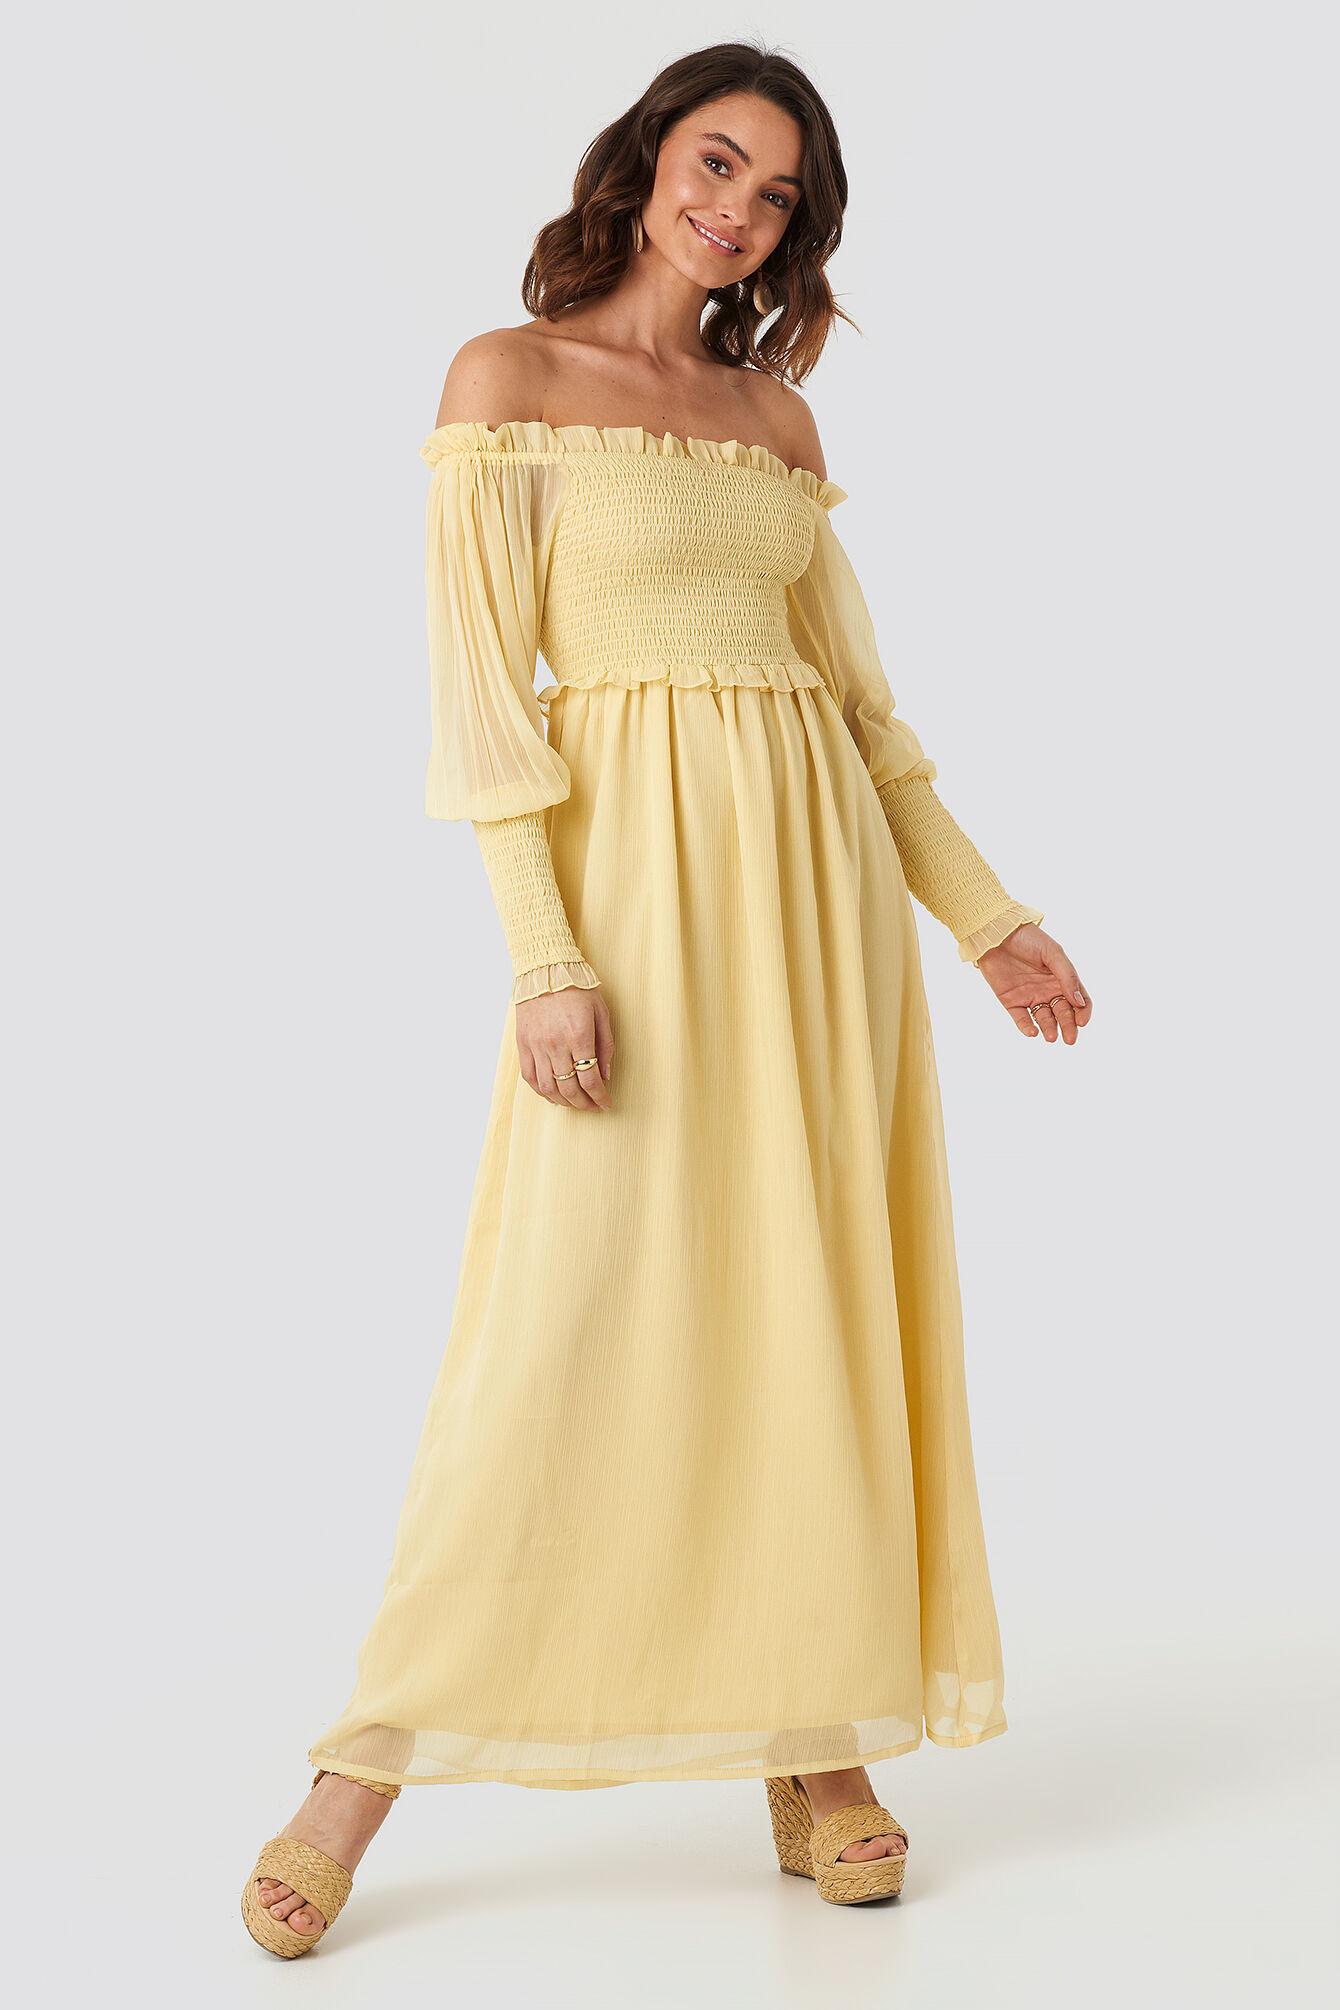 Image of NA-KD Trend Off Shoulder Smock Chiffon Dress - Yellow